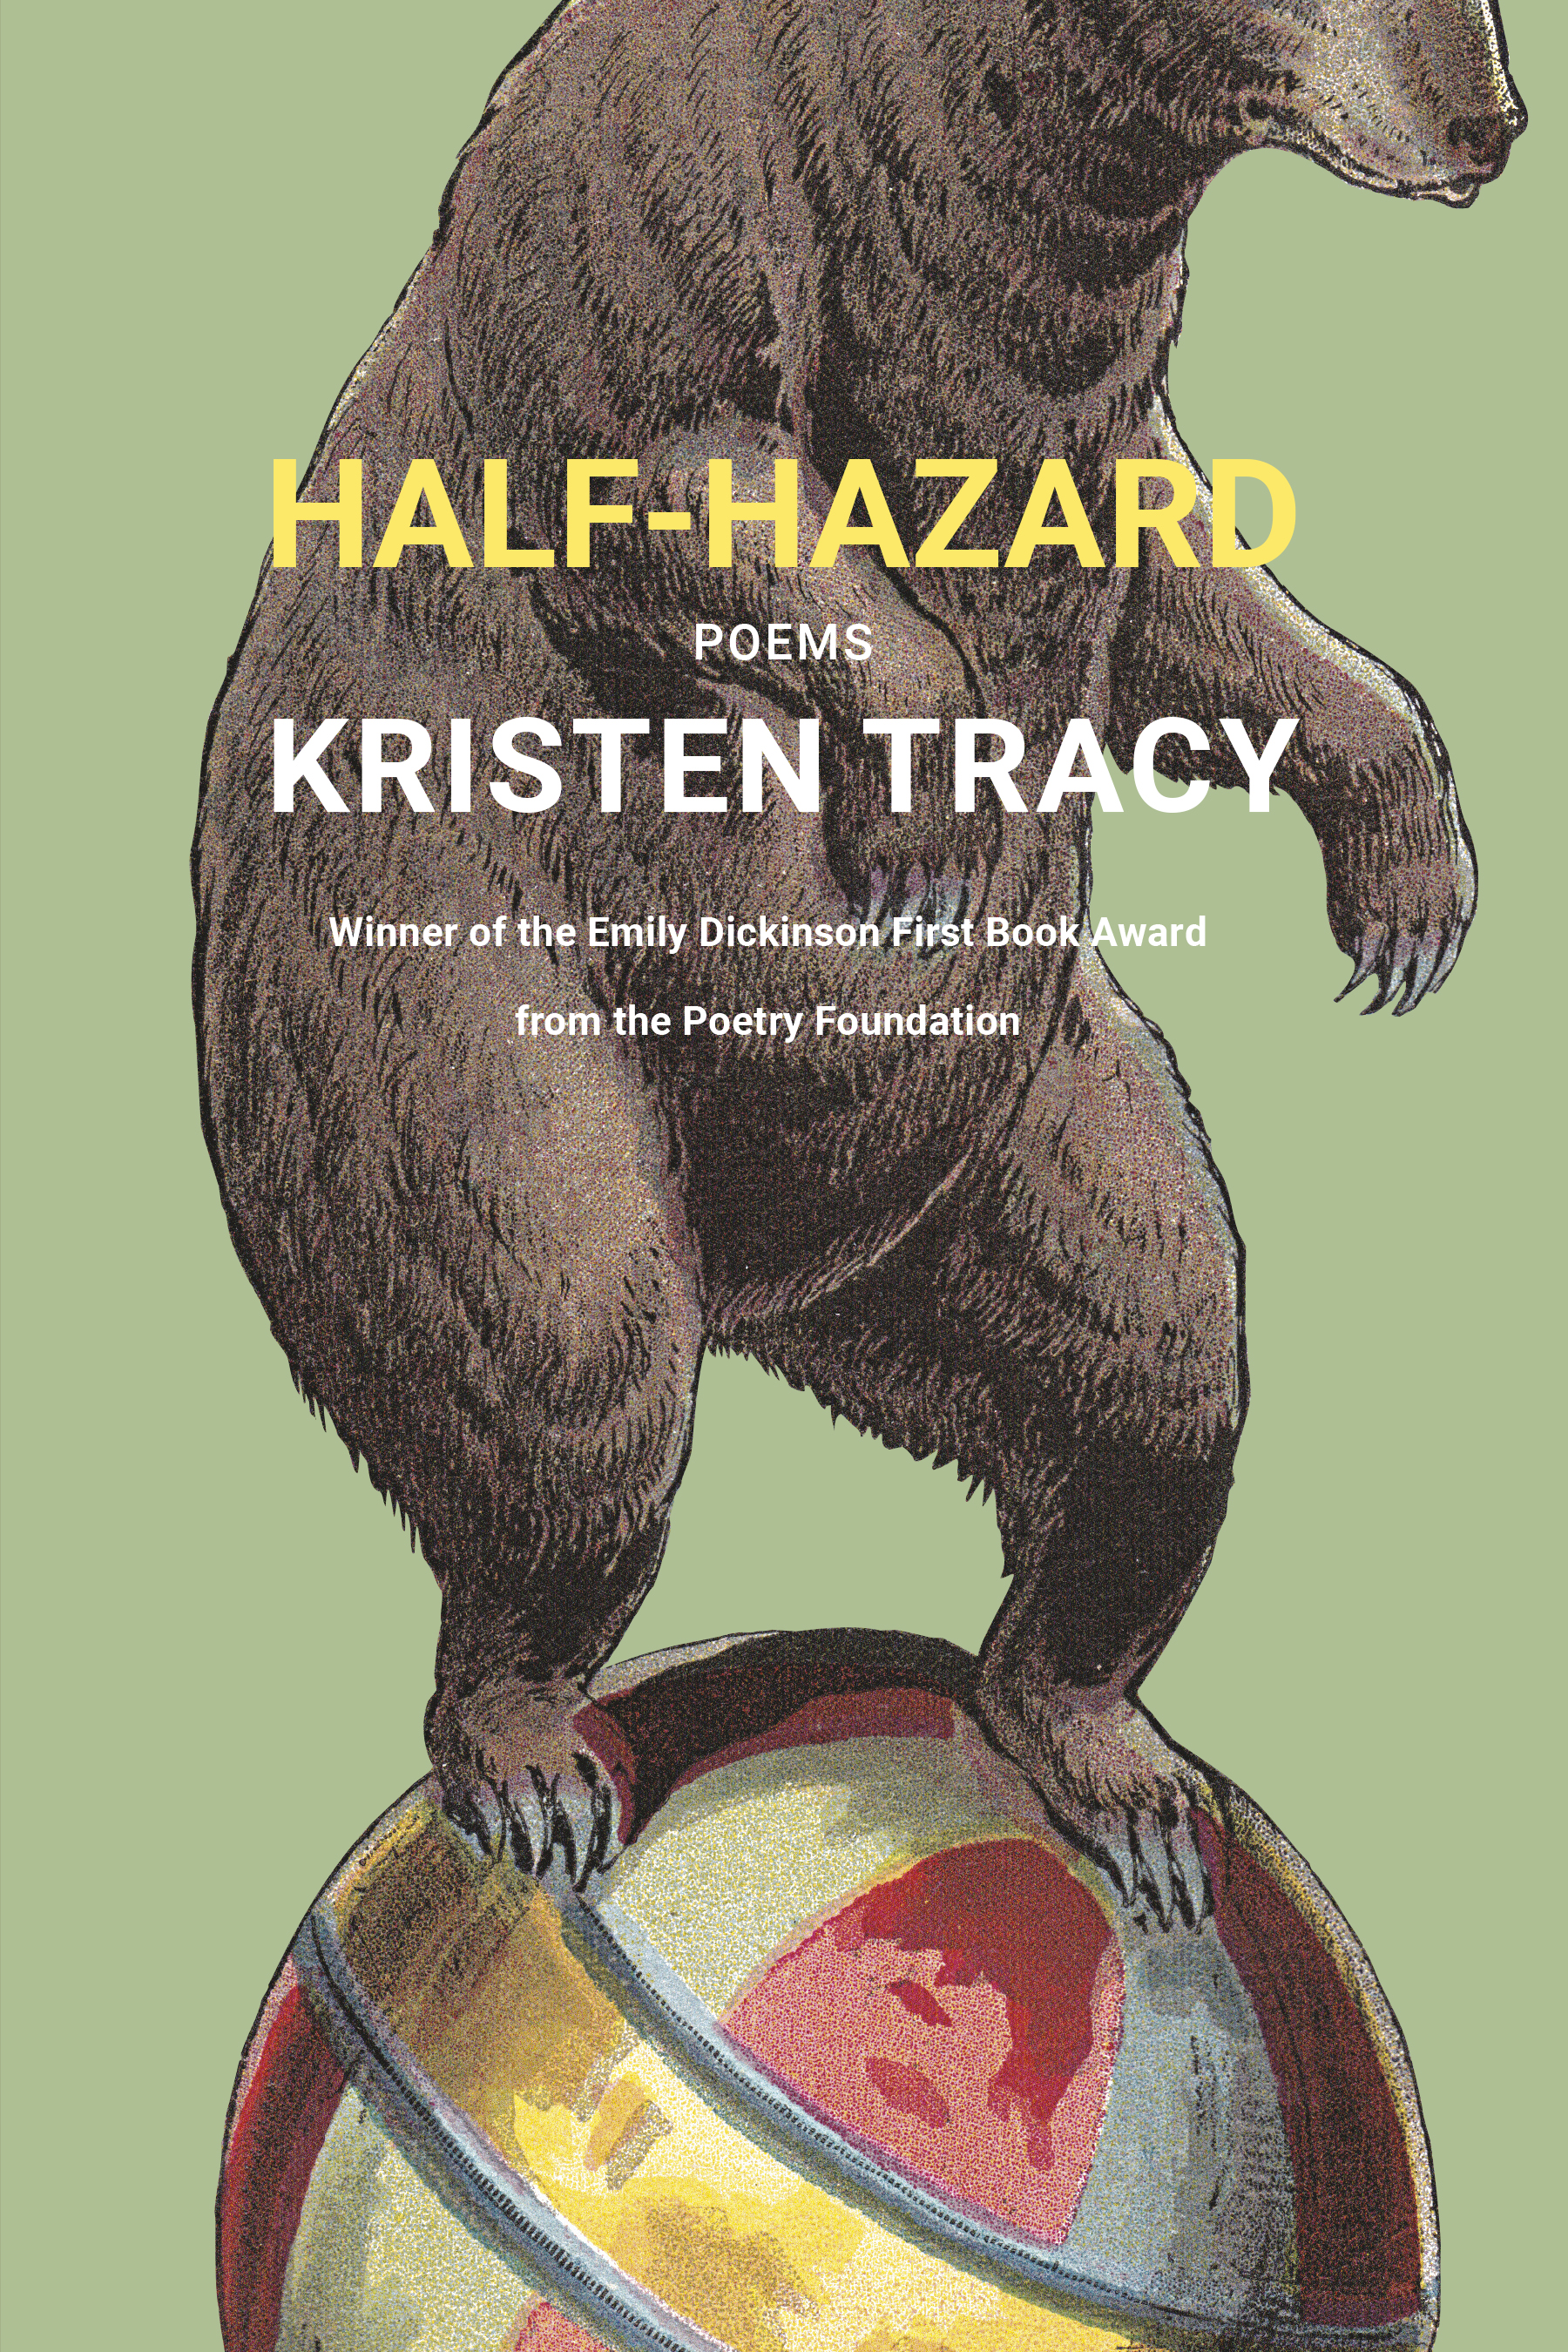 Interspecies Conflict: Q&A with 'Half-Hazard' author Kristen Tracy